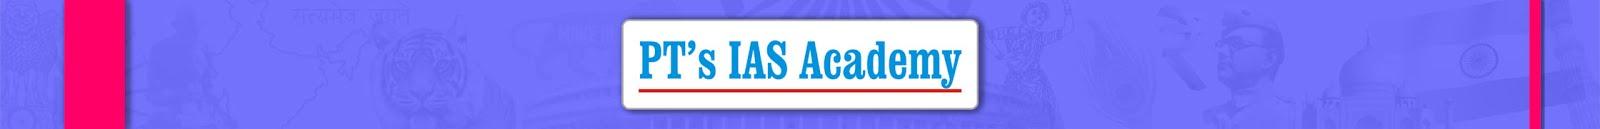 PT's IAS Academy